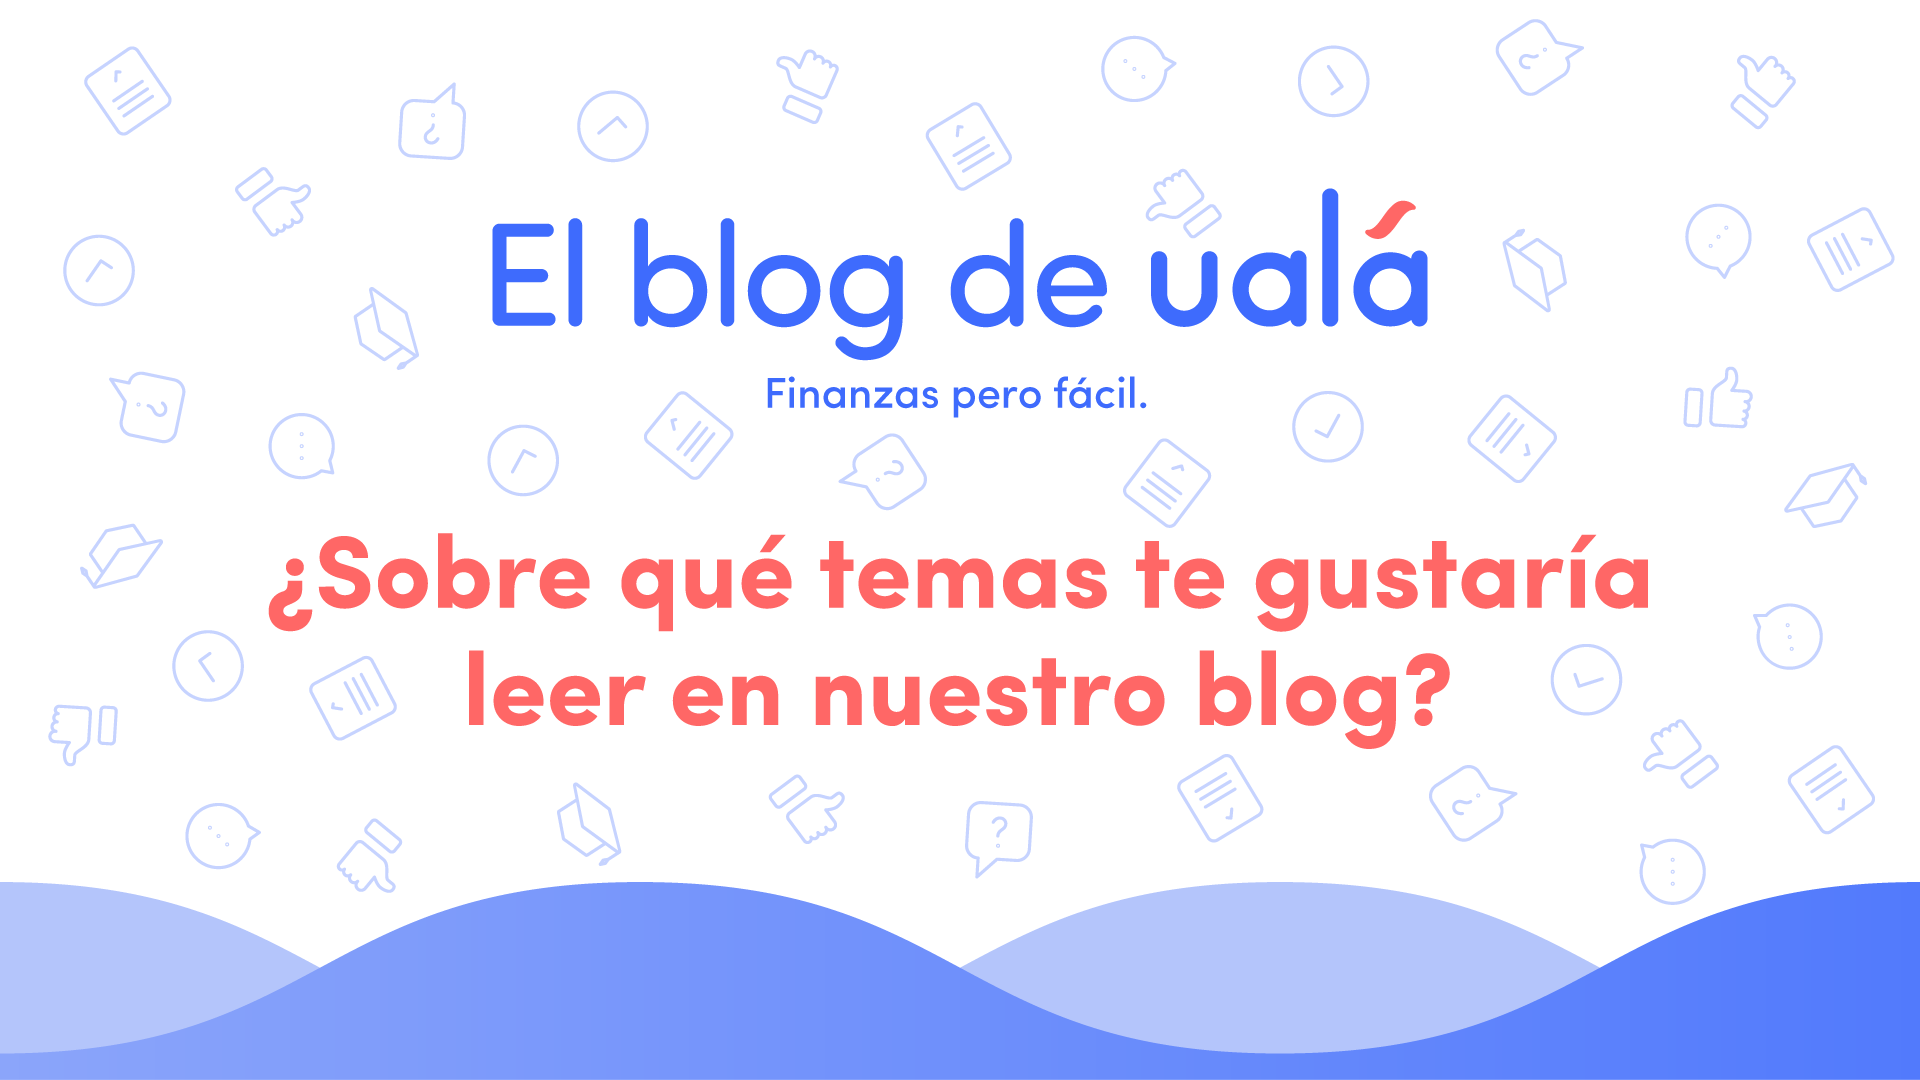 Blog de Ual